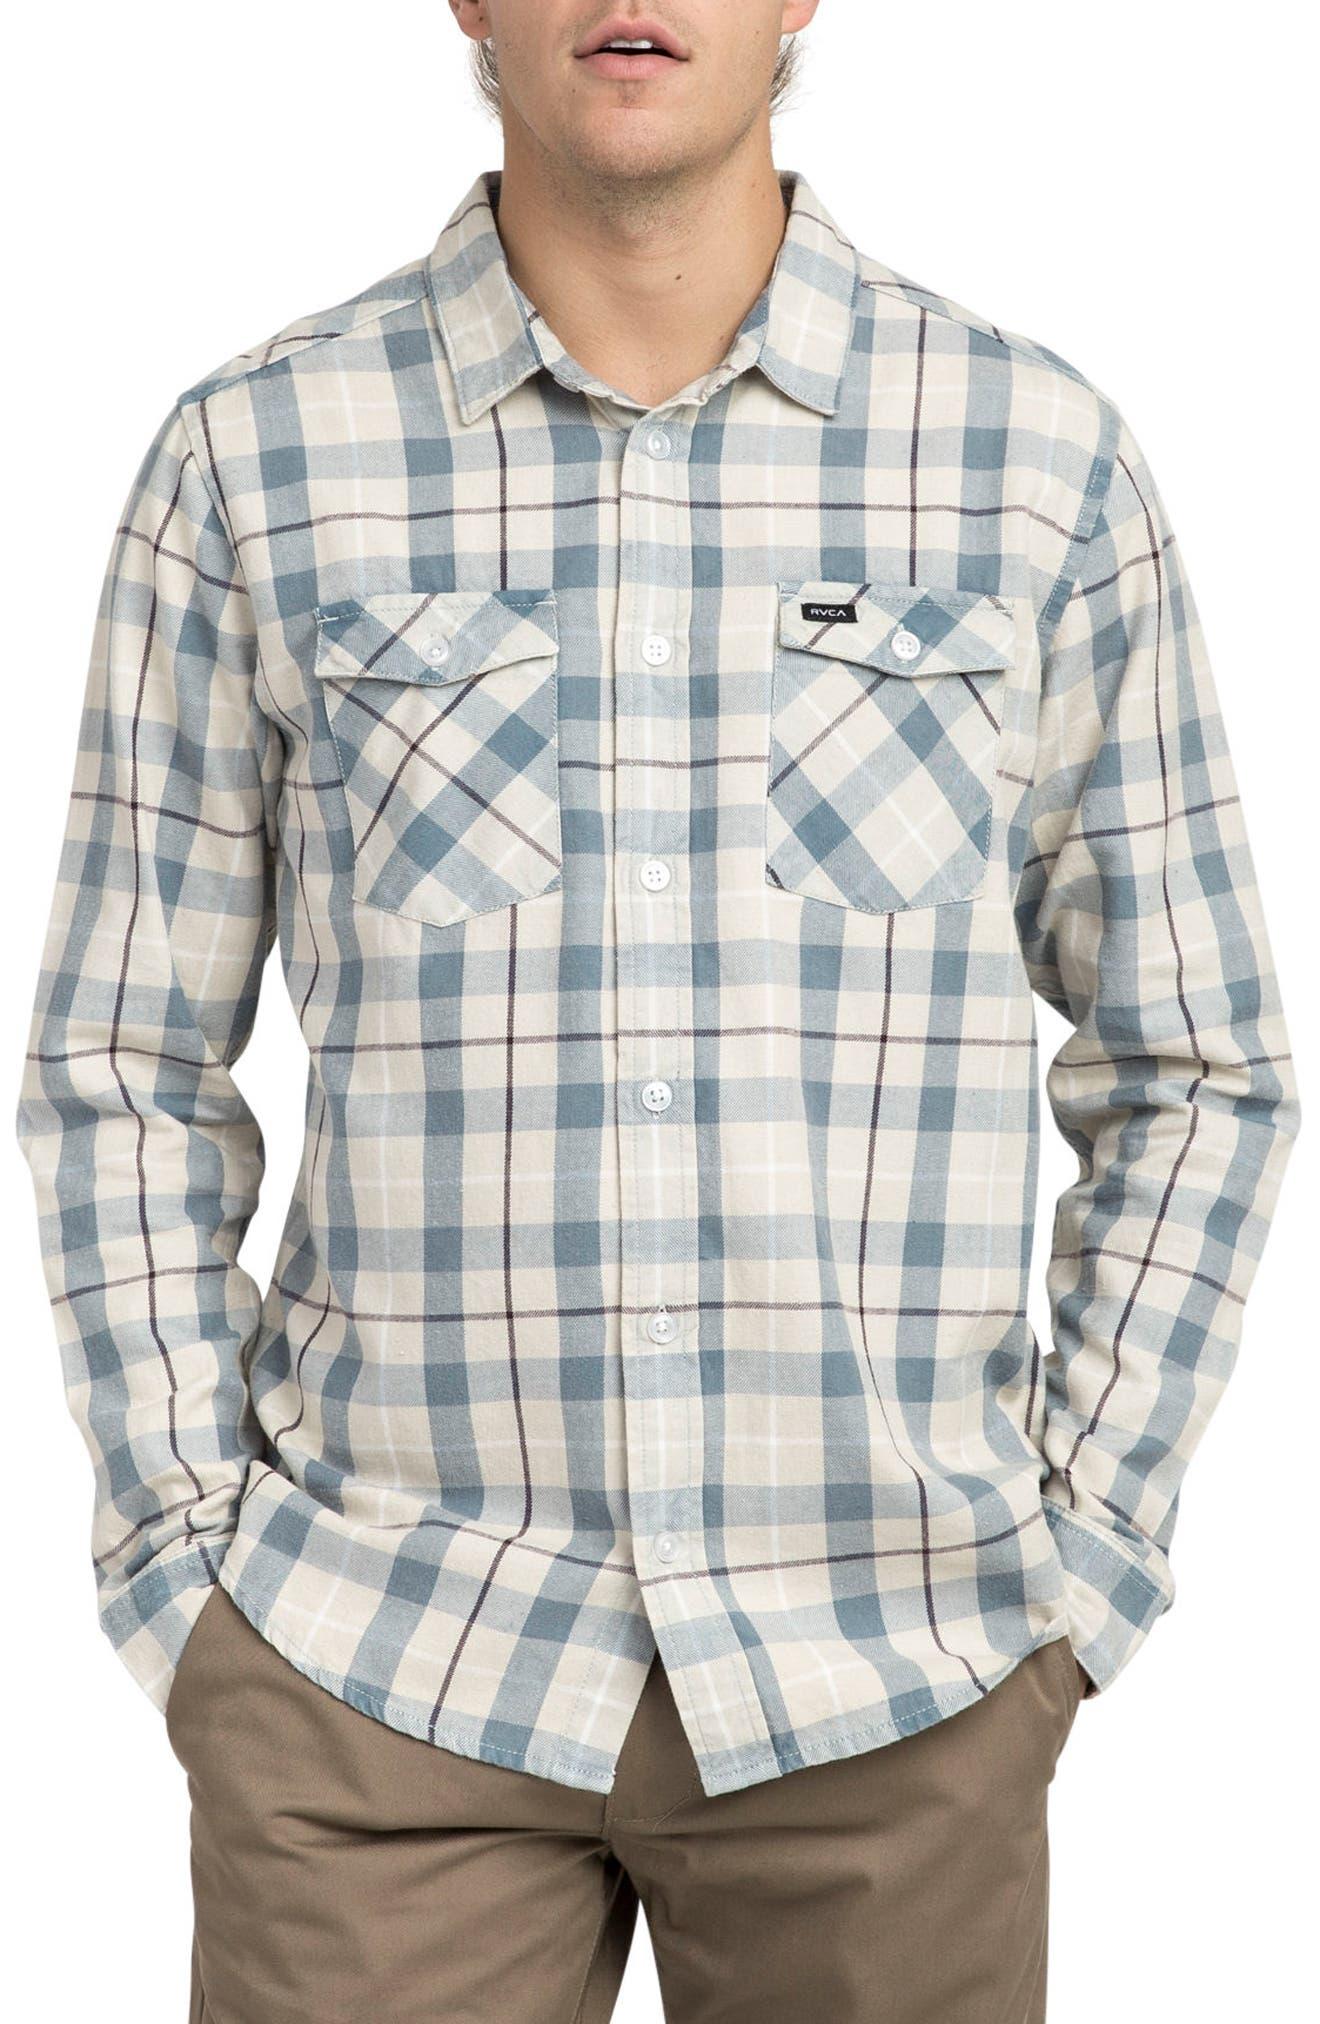 Treets Plaid Flannel Shirt,                         Main,                         color, 020